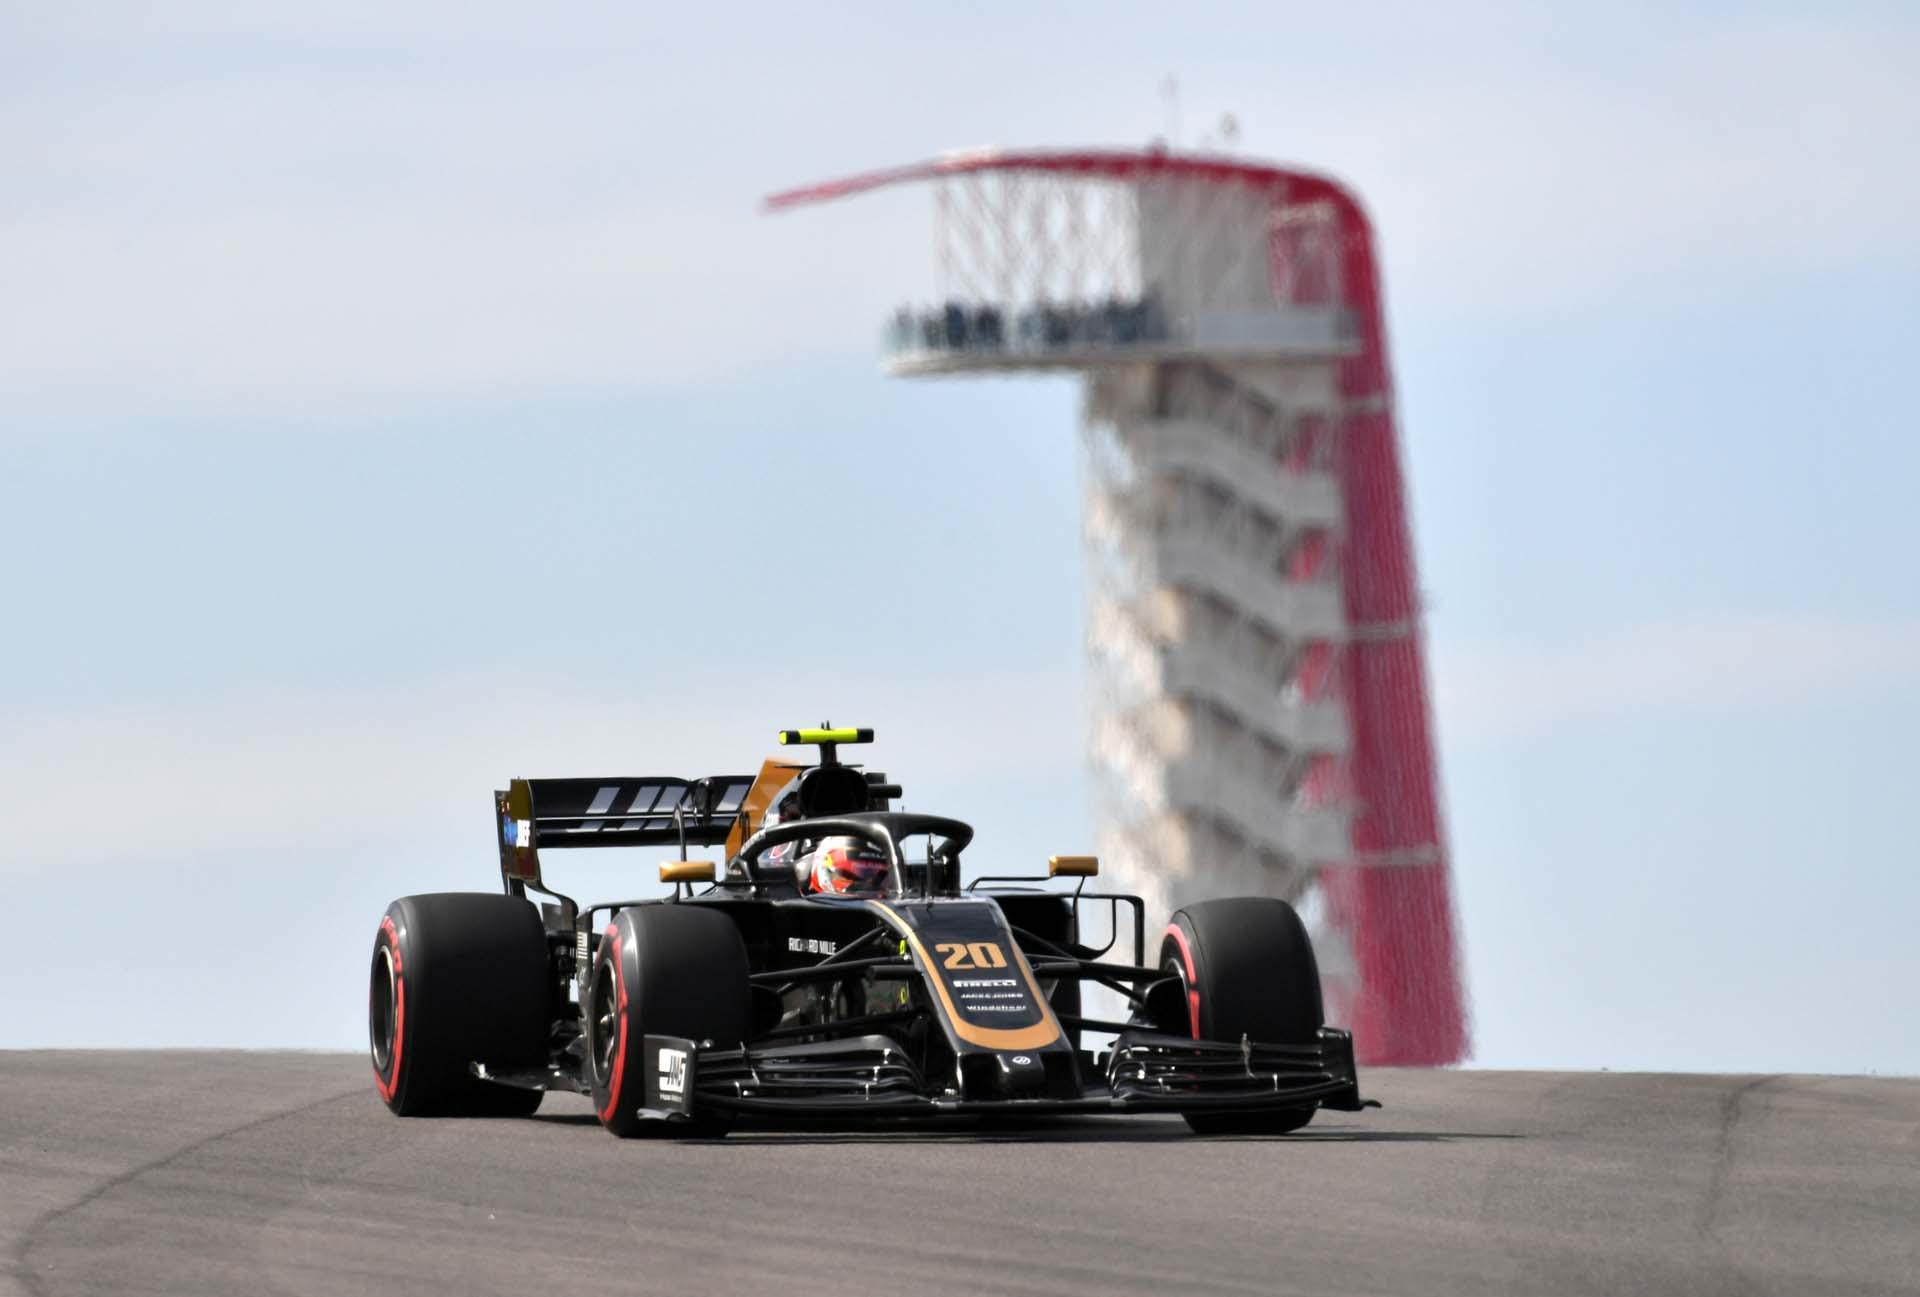 2019 United States GP